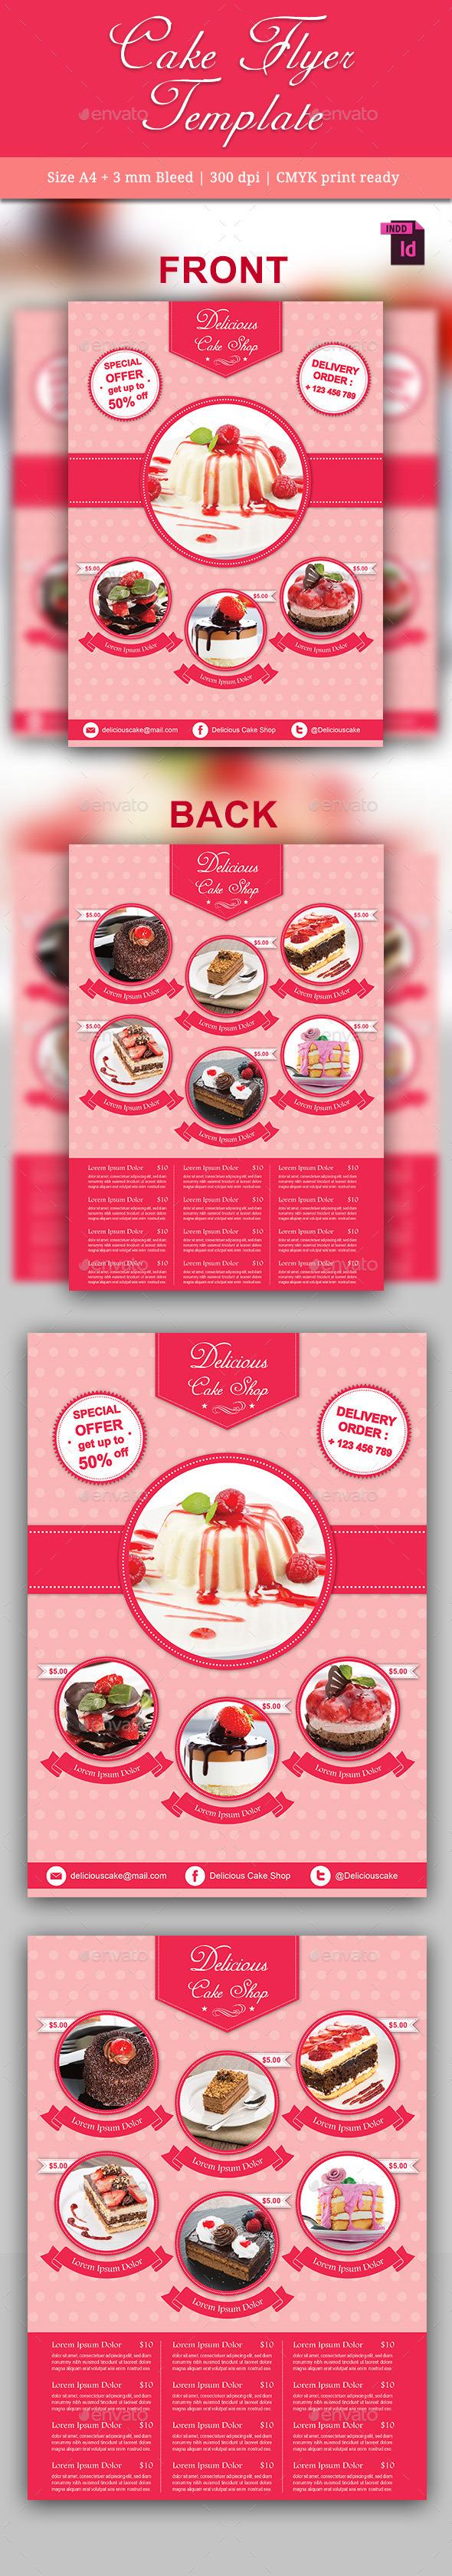 Cake Flyer Template - Restaurant Flyers